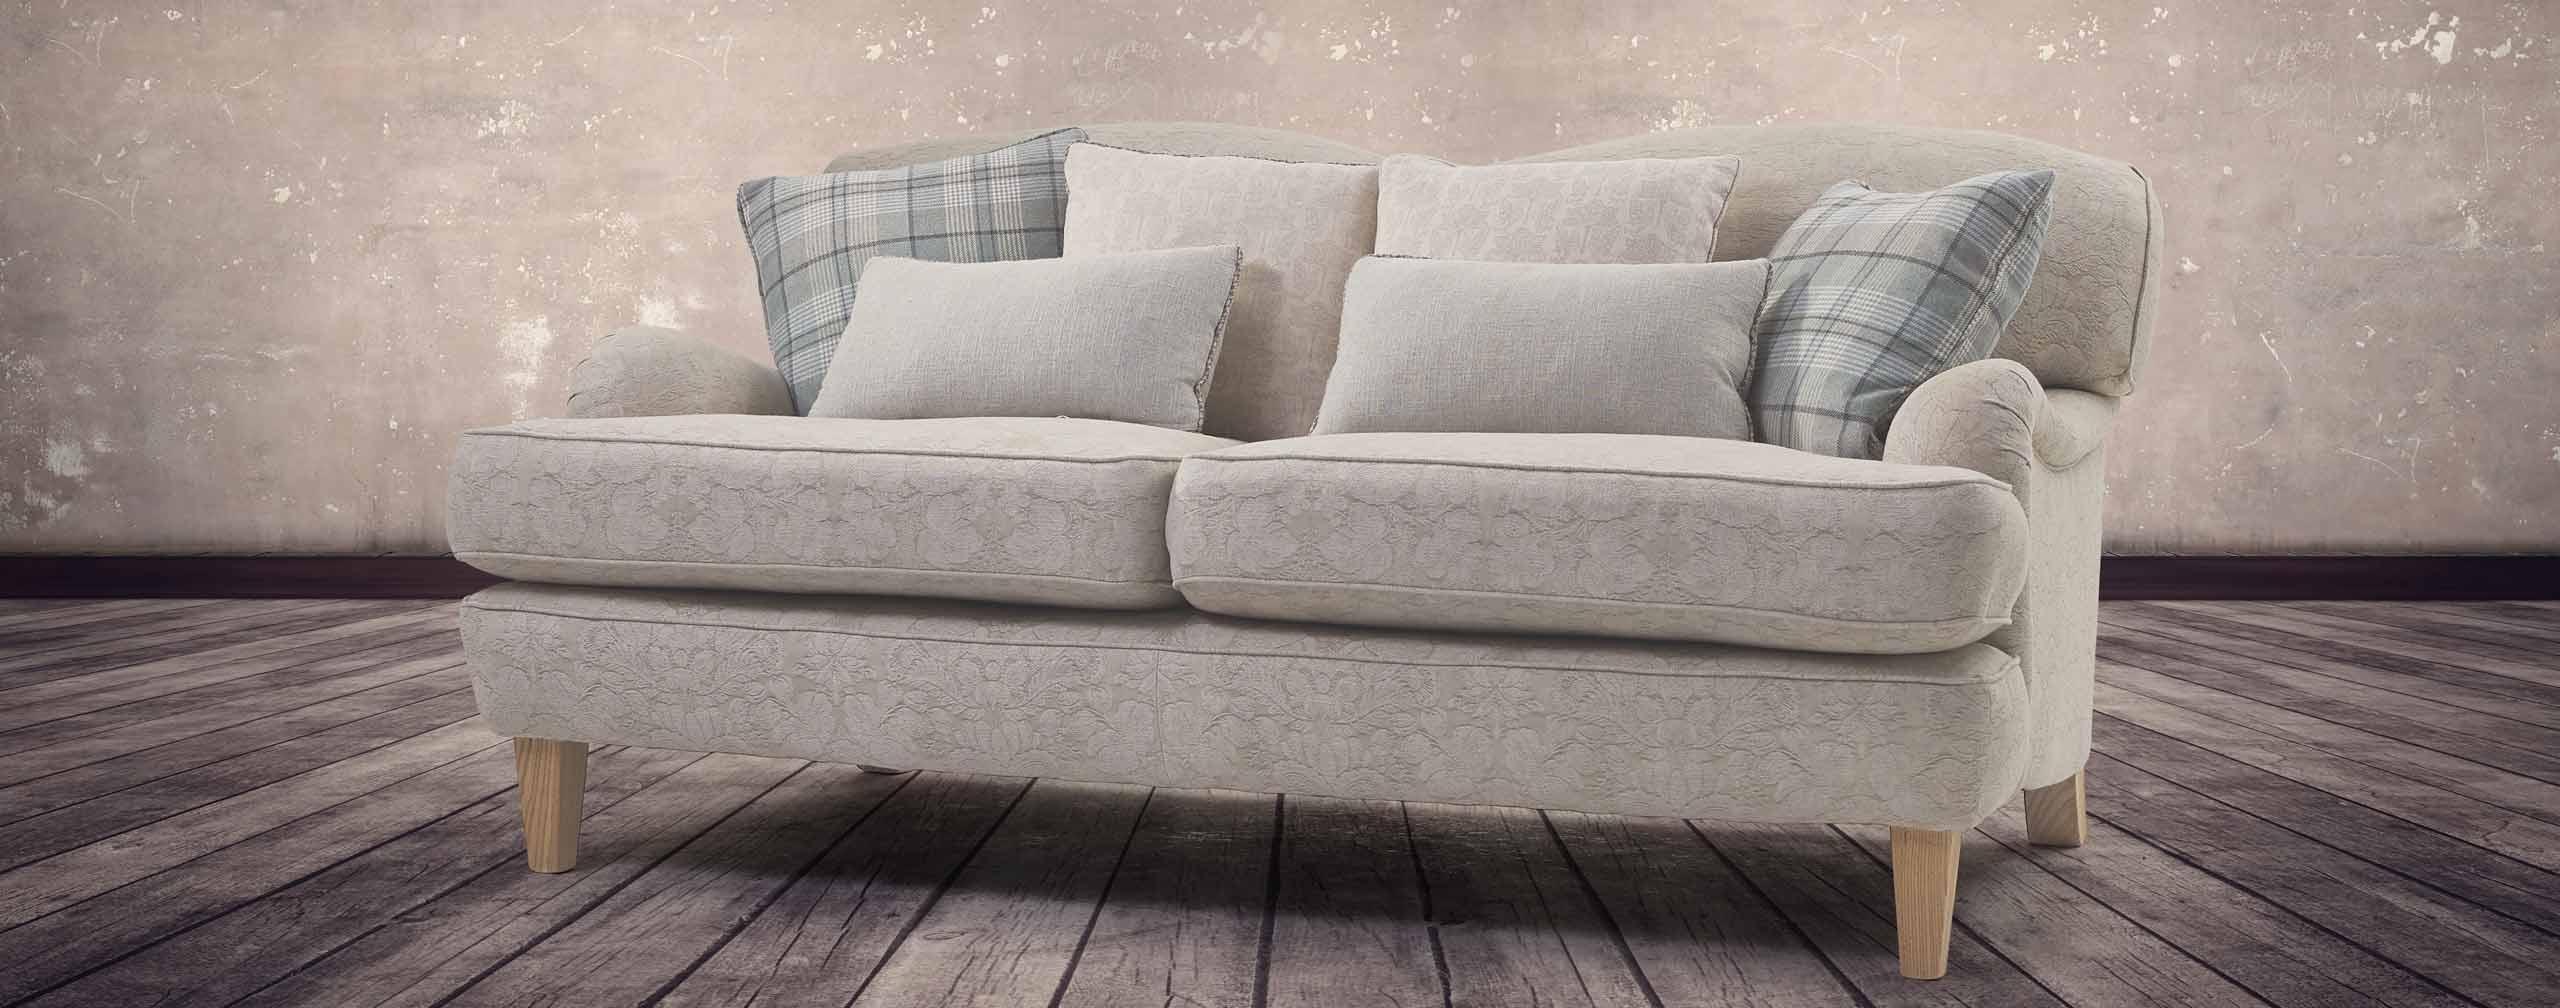 Sofa Banner